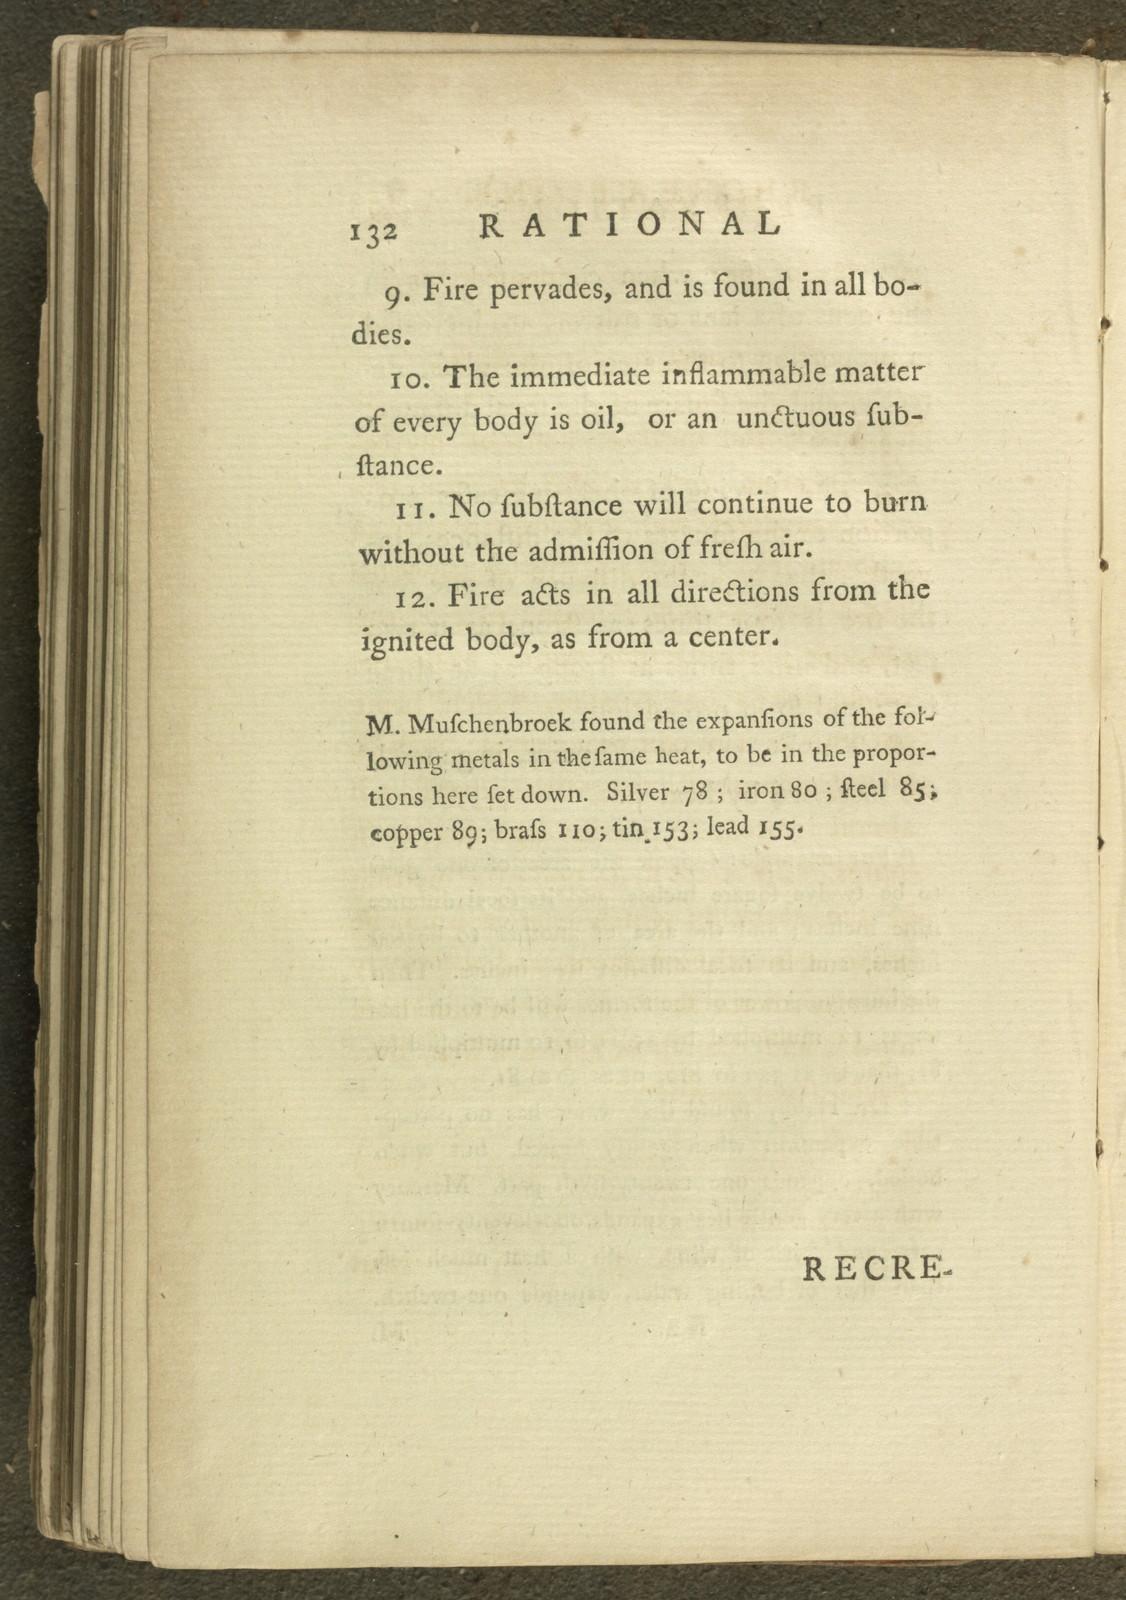 Rational Recreations, Volume IV